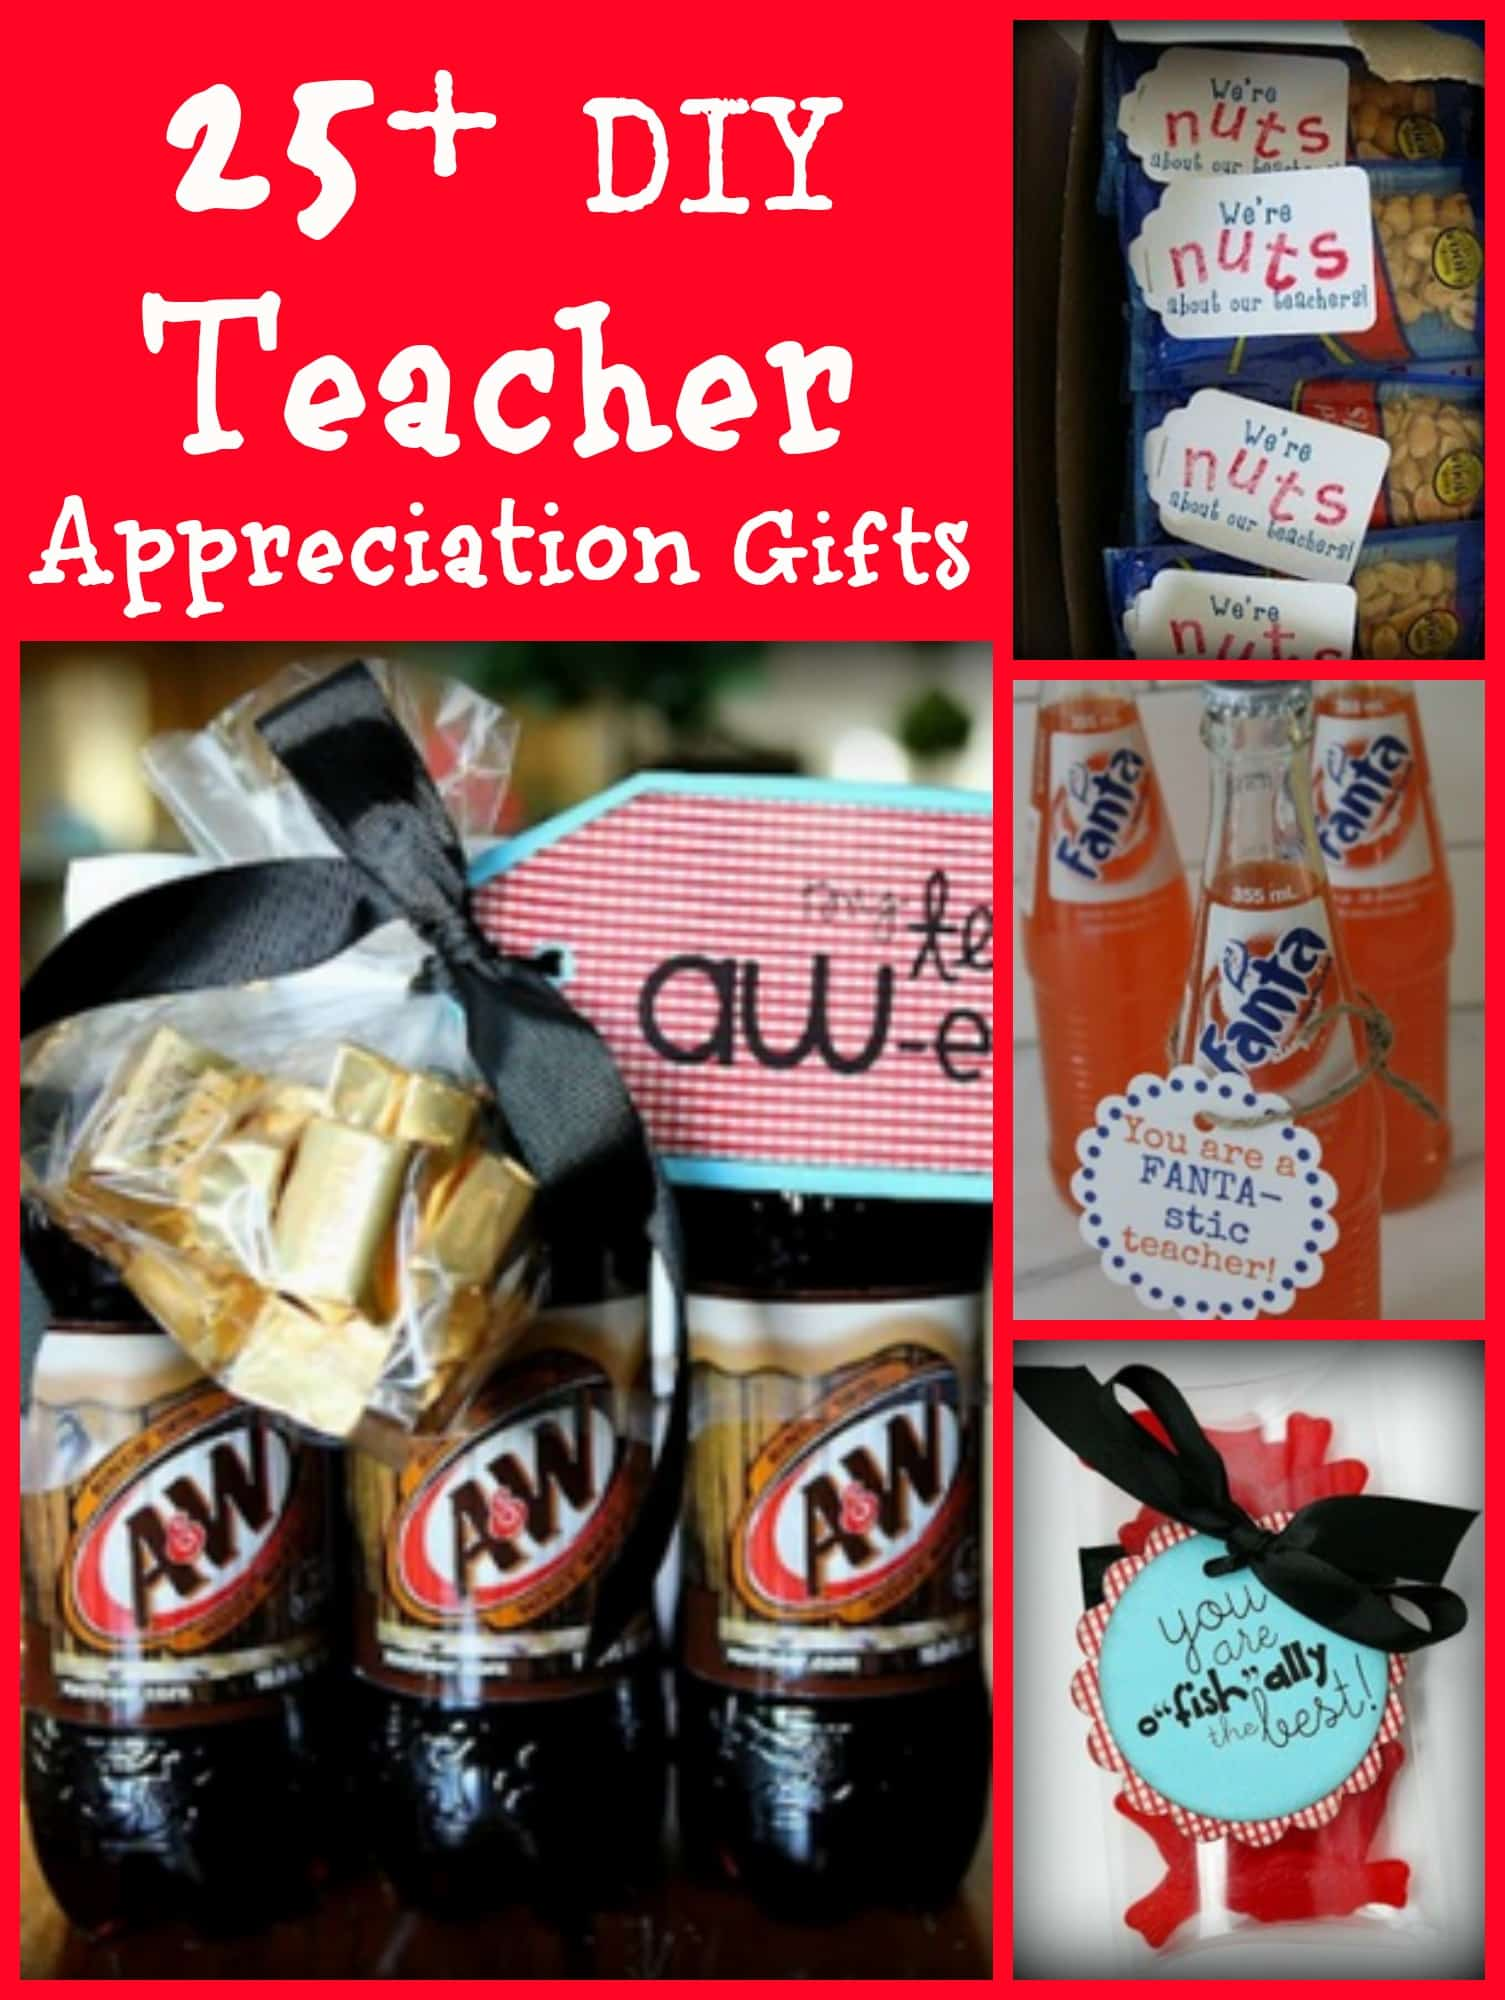 25 Teacher Appreciation DIY Gifts